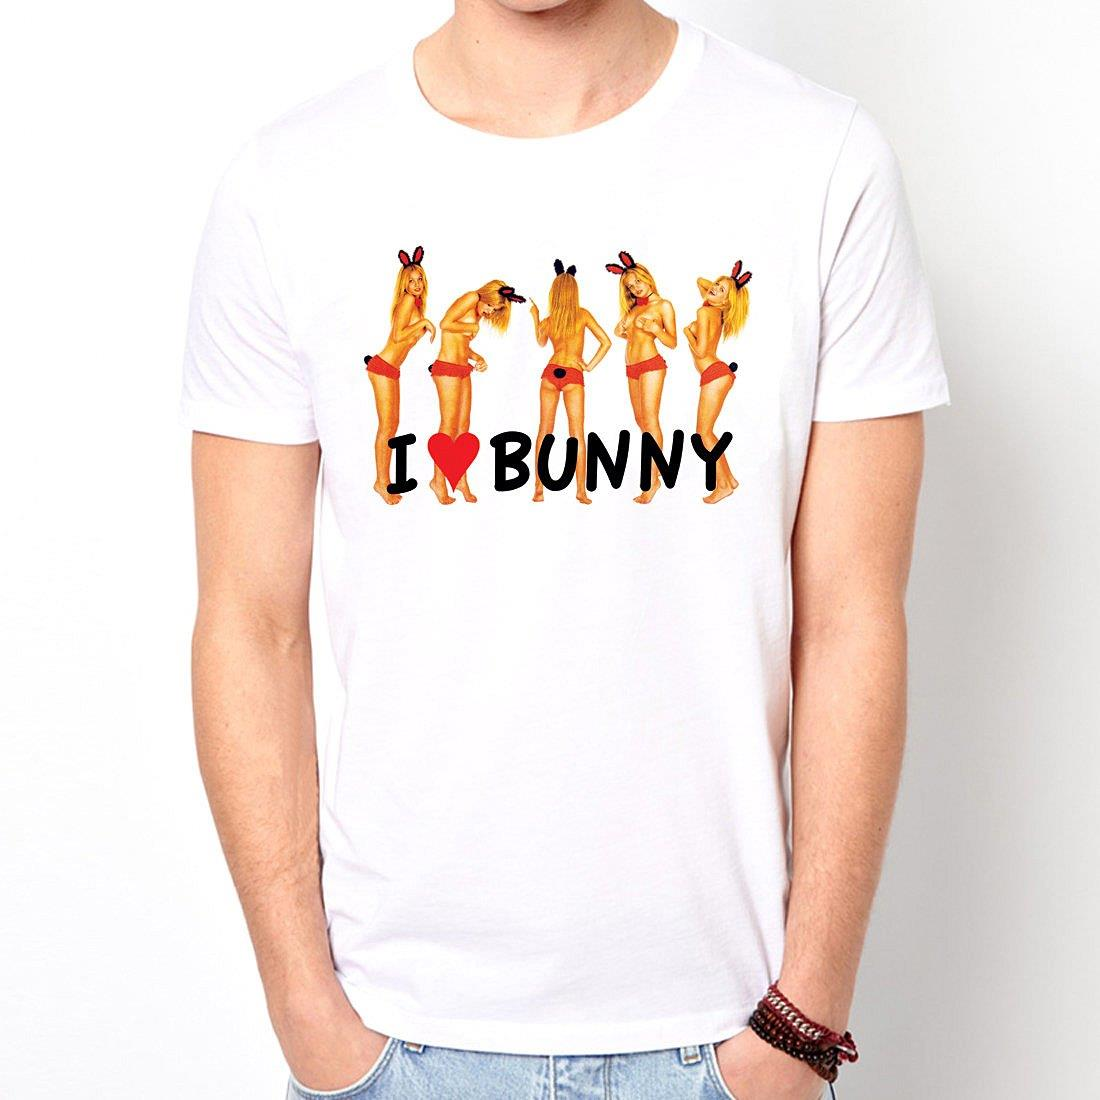 I Love Bunny短袖T恤~白色 趣味幽默 插畫裸女潮流情色KUSO樂團玩翻